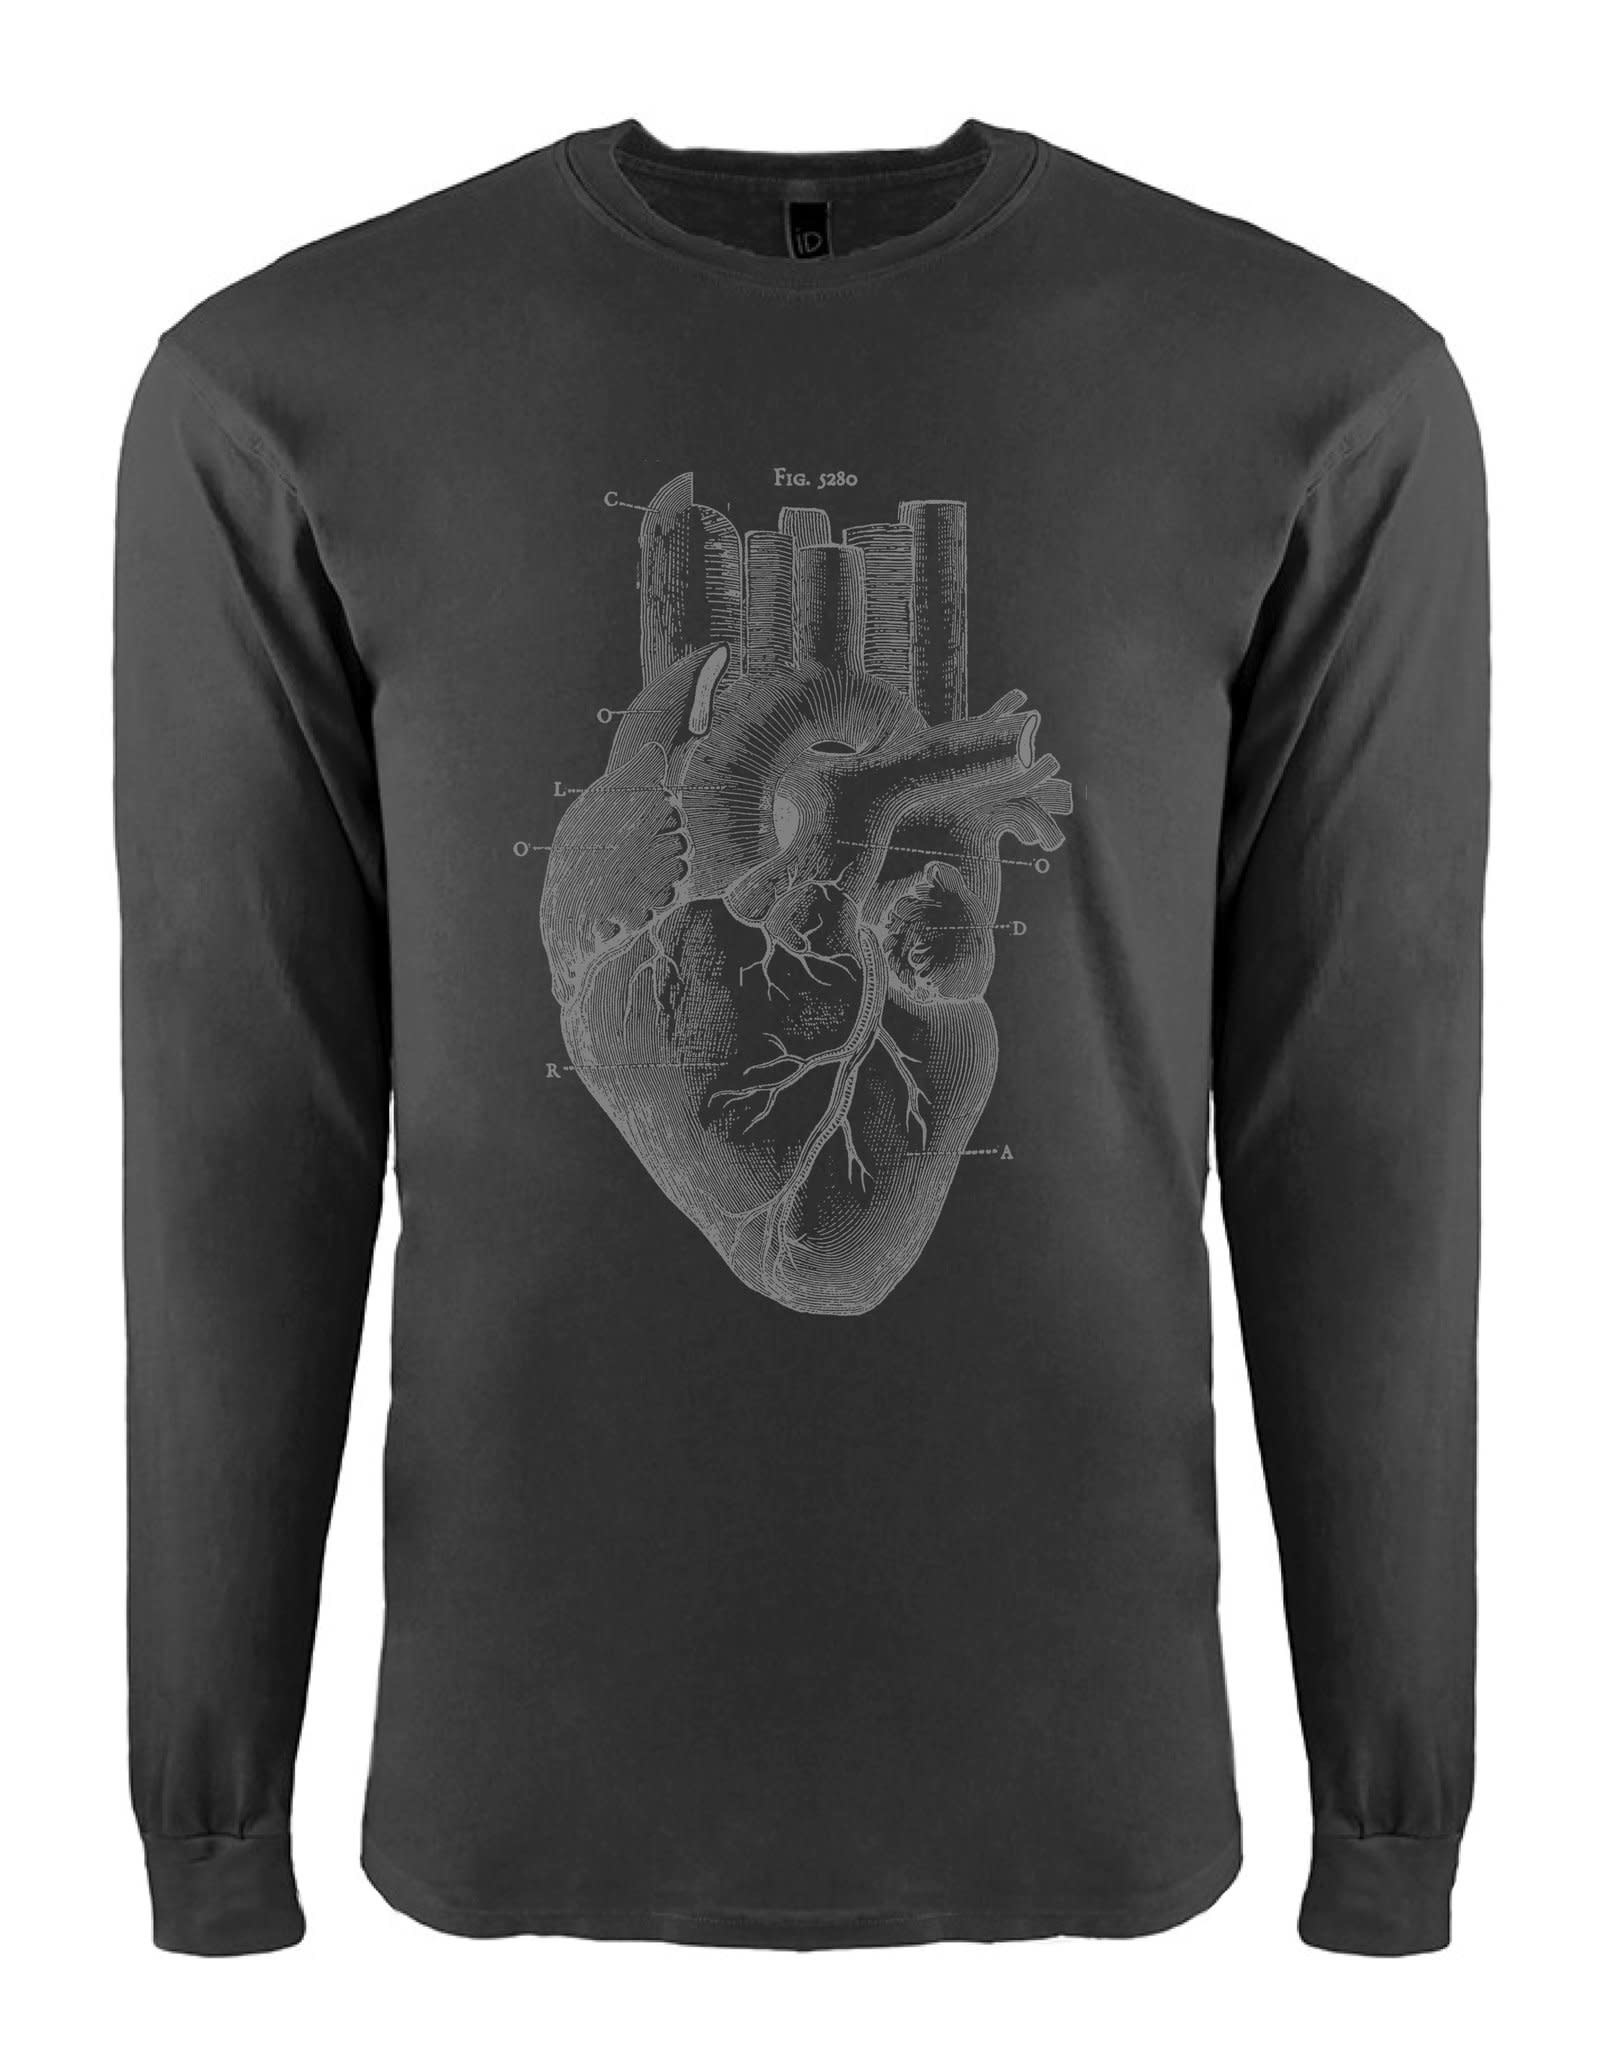 Buckley Omega Heart of the City Long Sleeve Tee